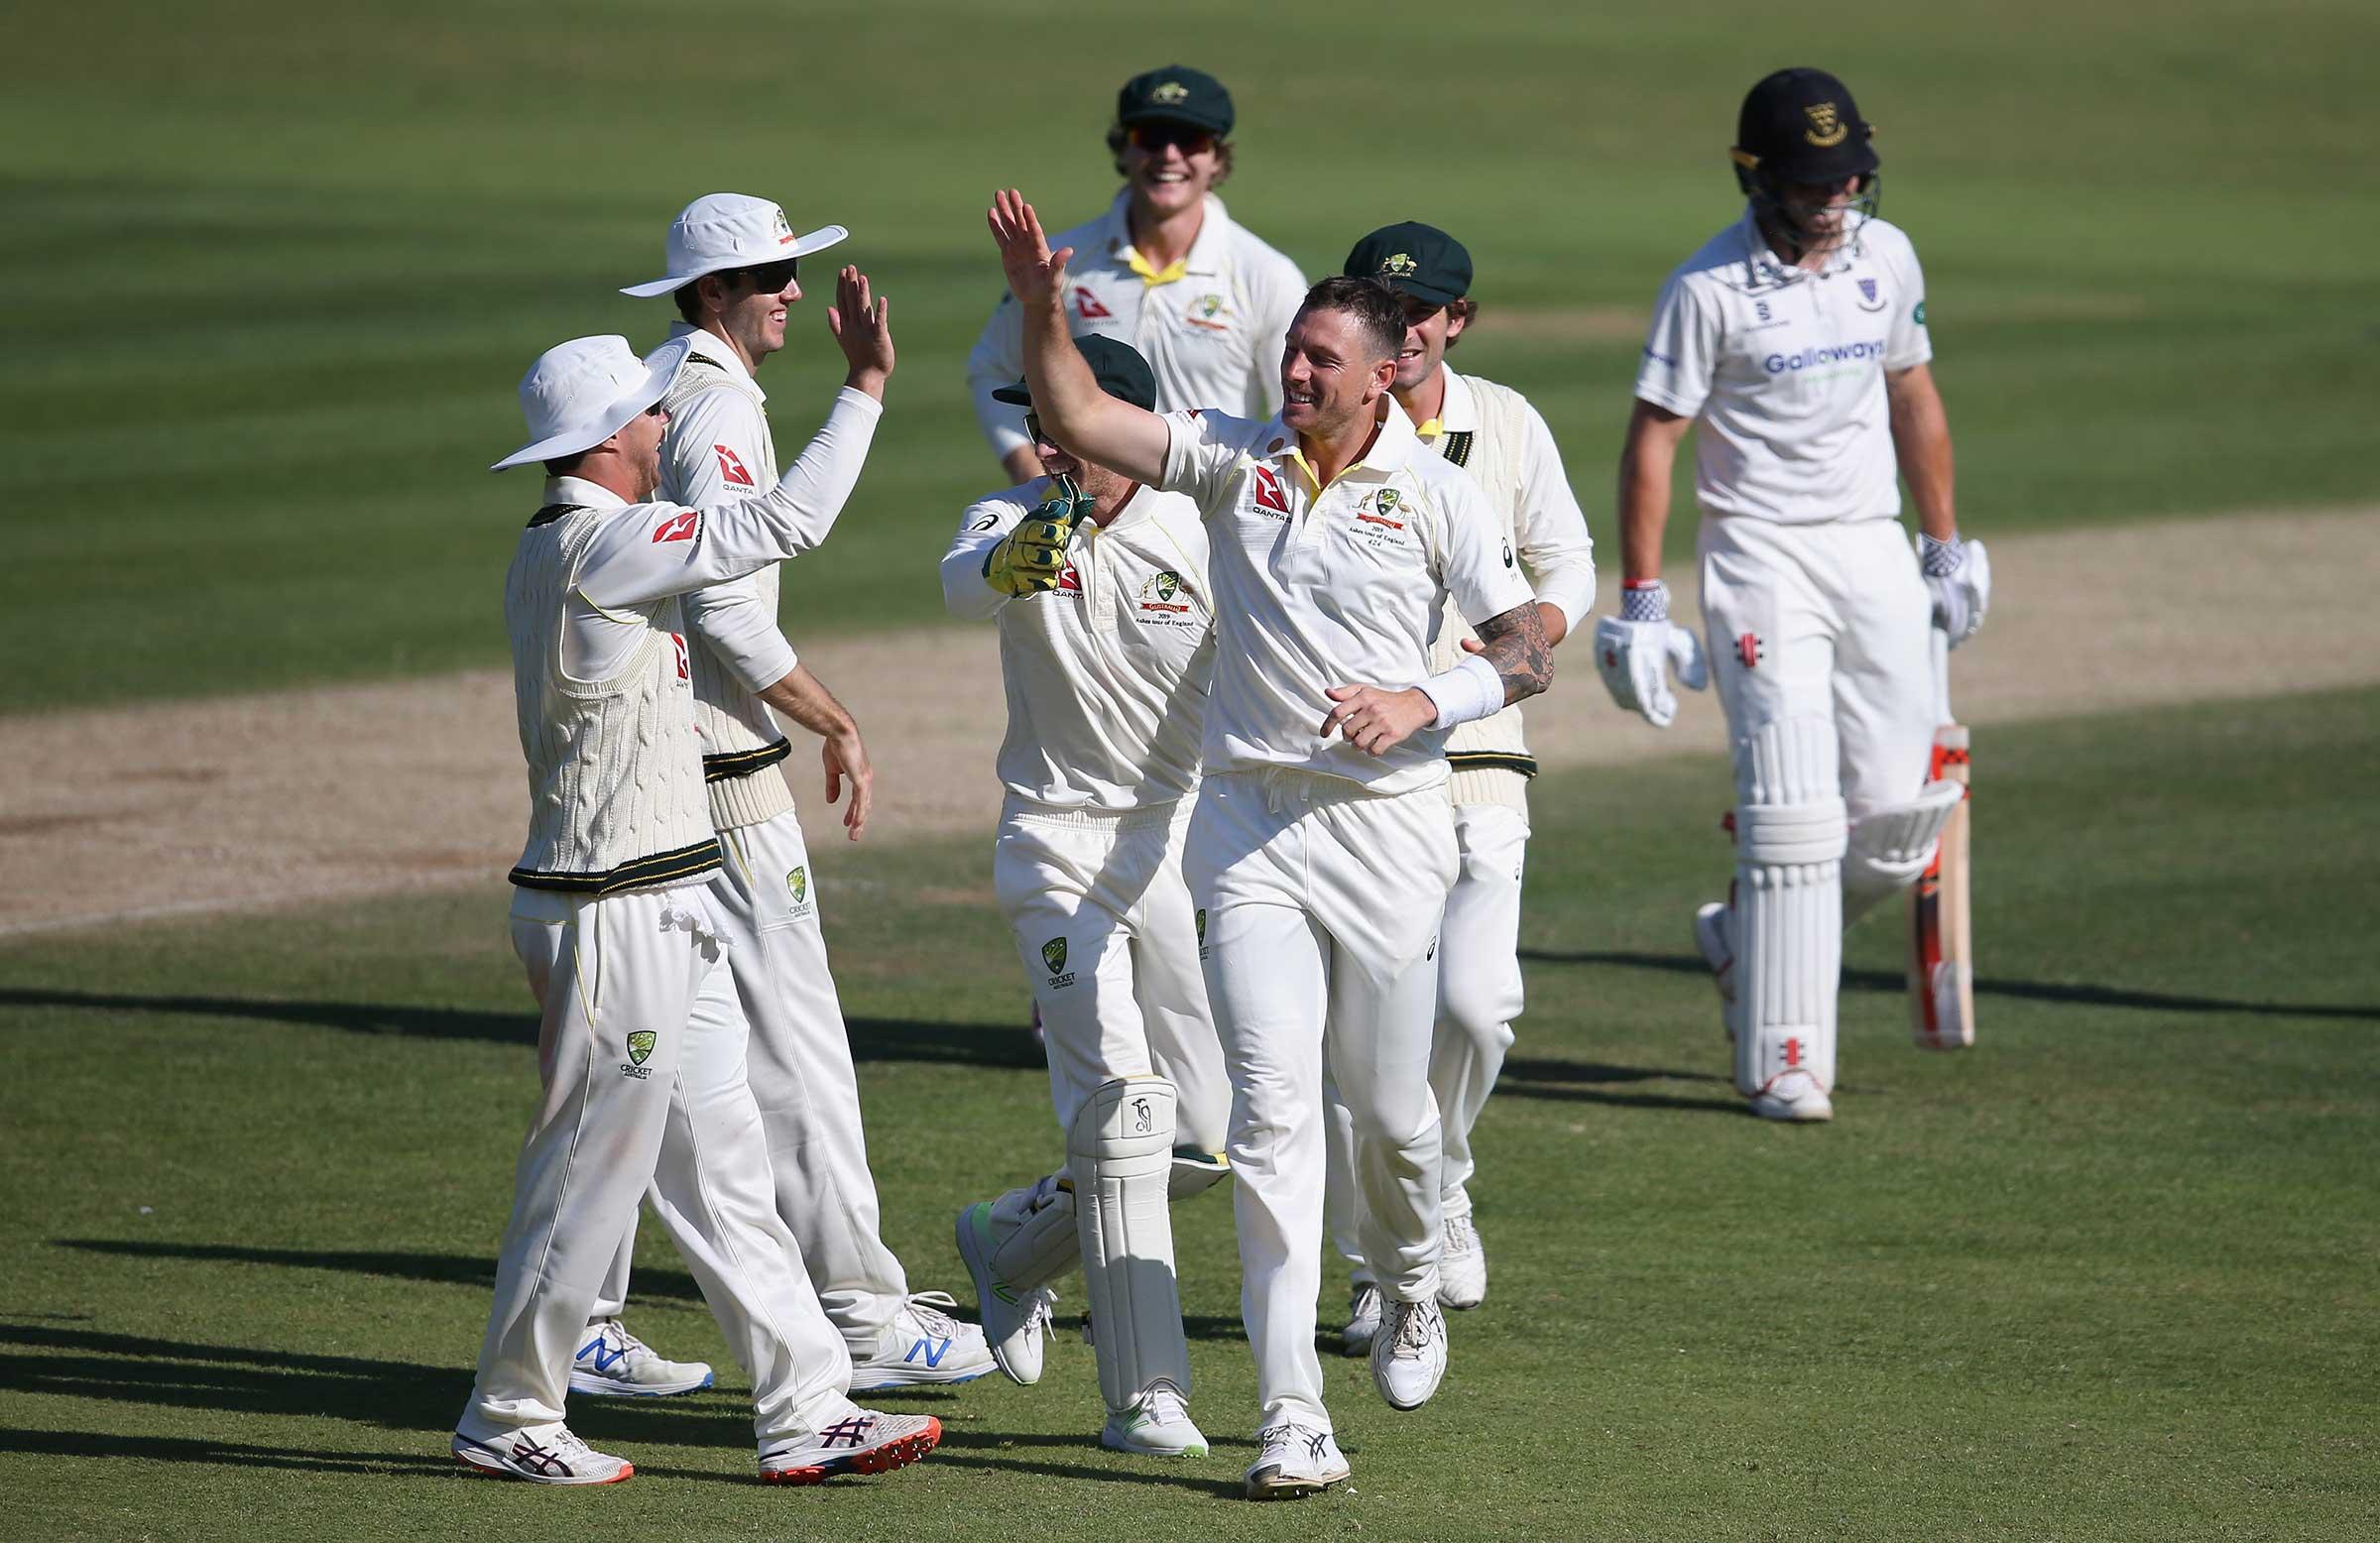 James Pattinson celebrates a wicket for Australia A // Getty